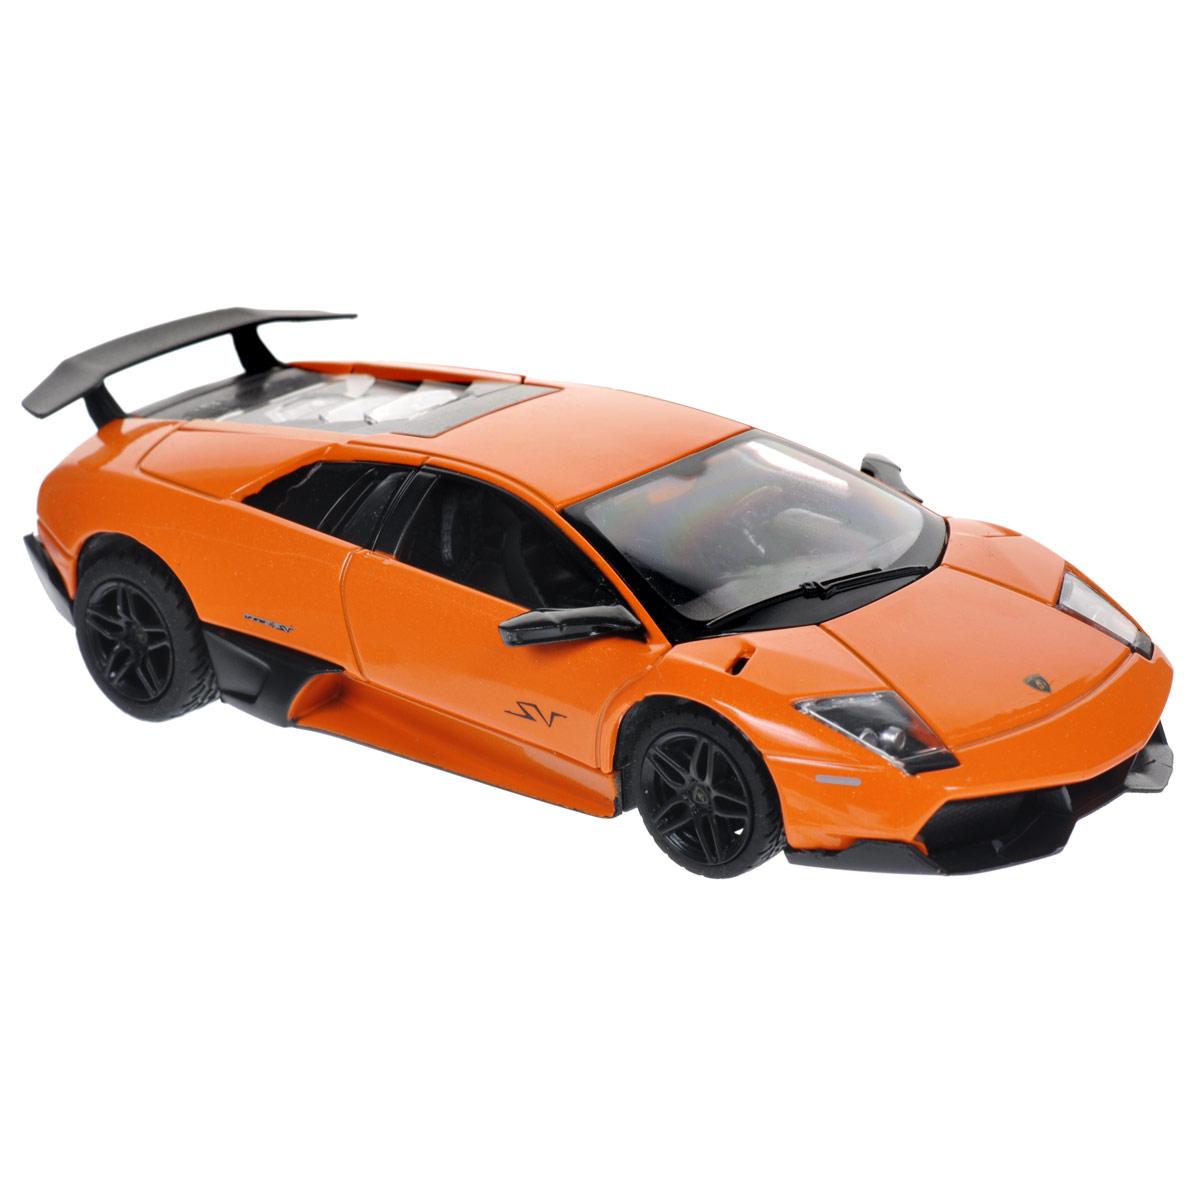 Rastar Модель автомобиля Lamborghini Murcielago LP670-4 цвет оранжевый 39400